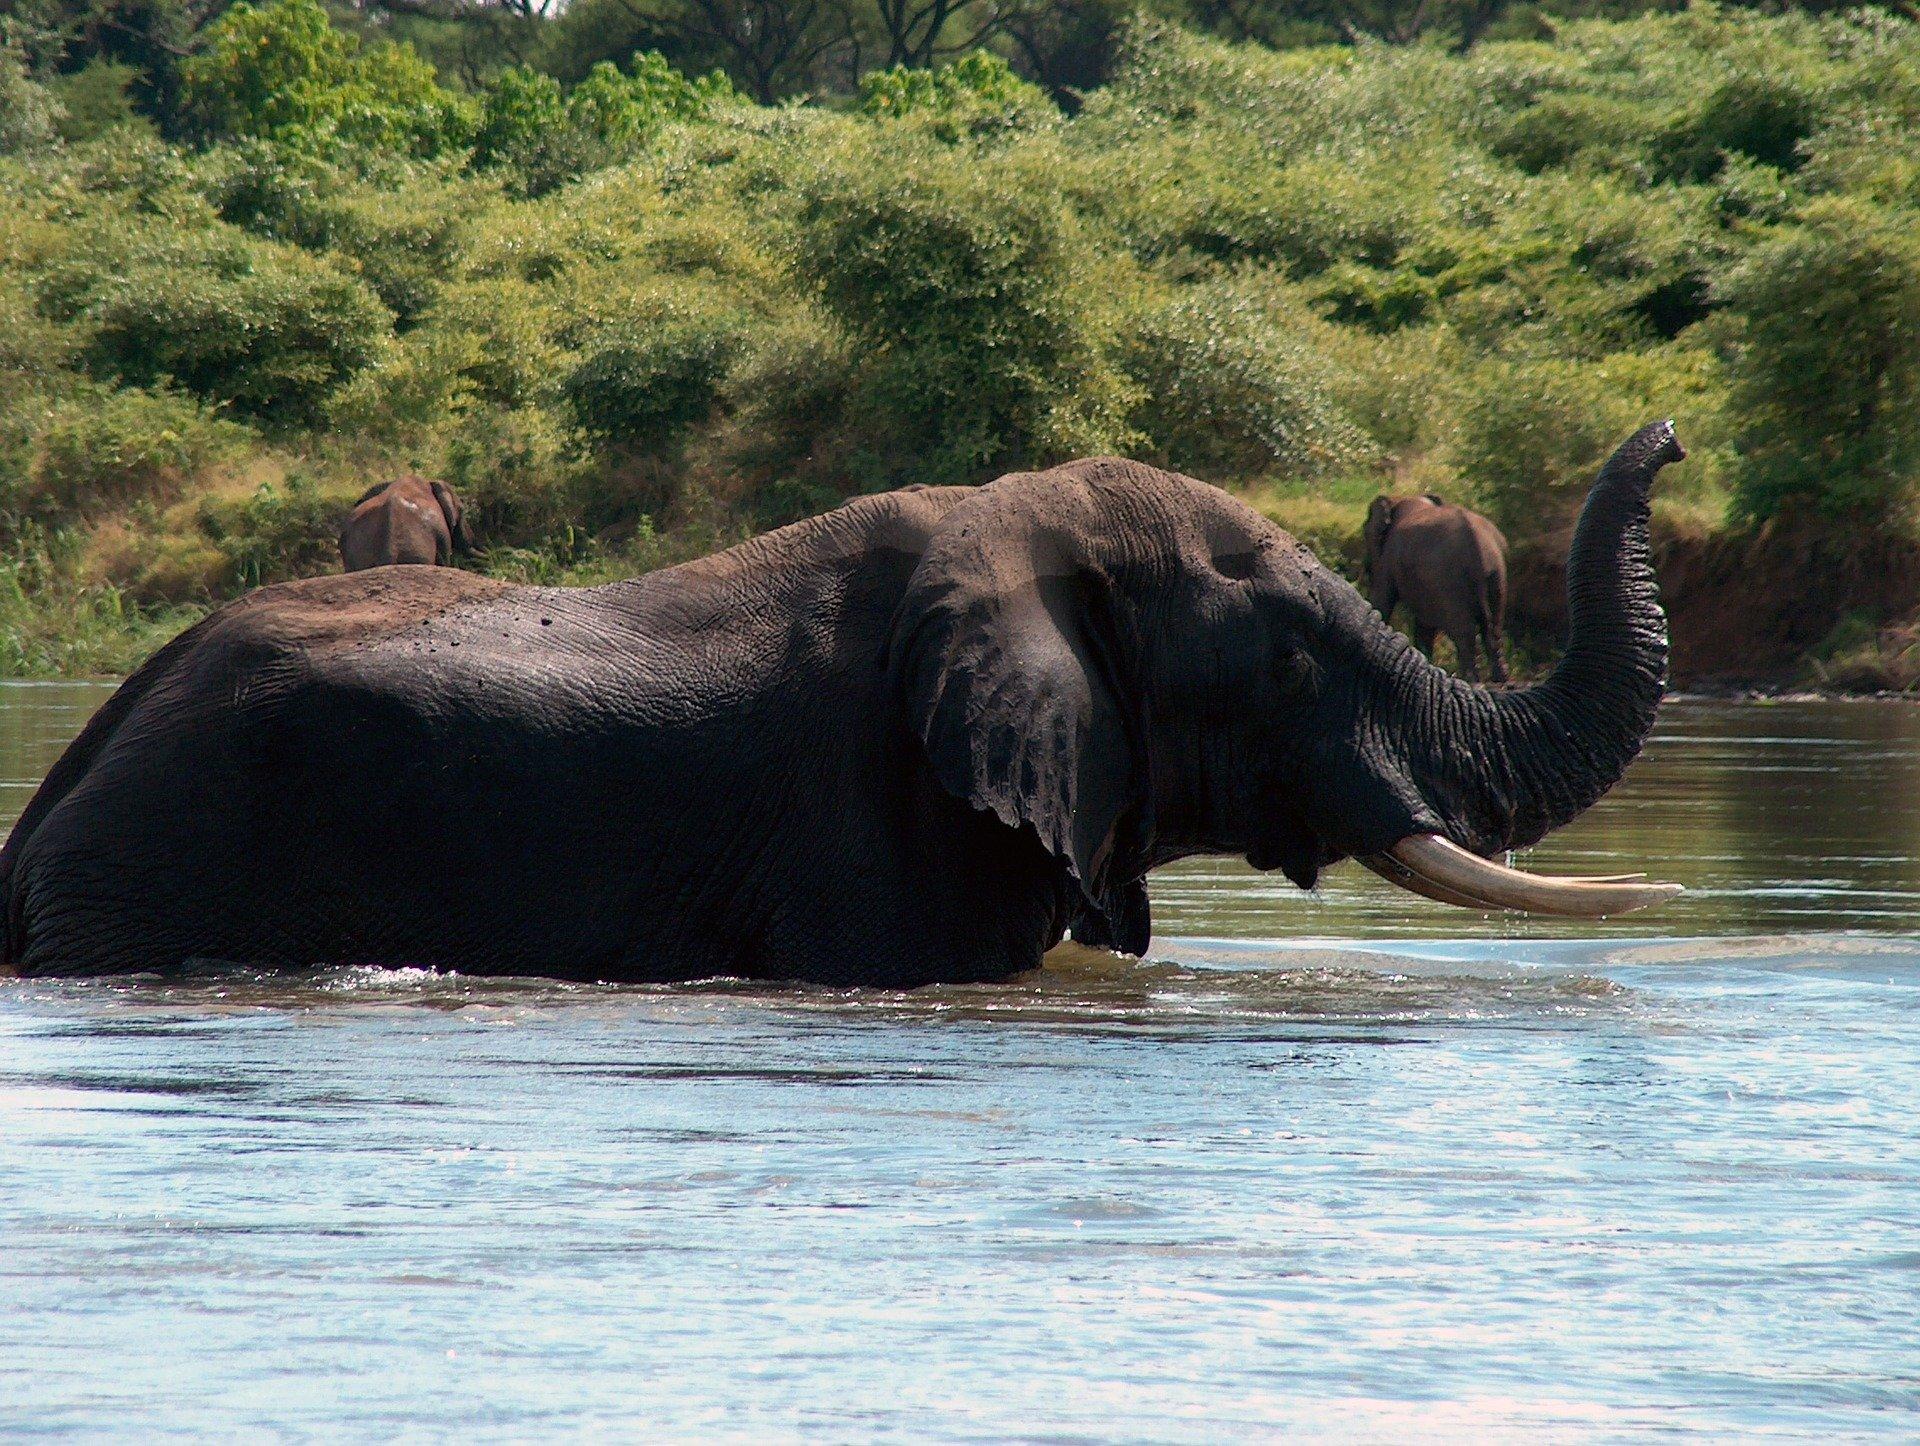 elephant-1351906_1920